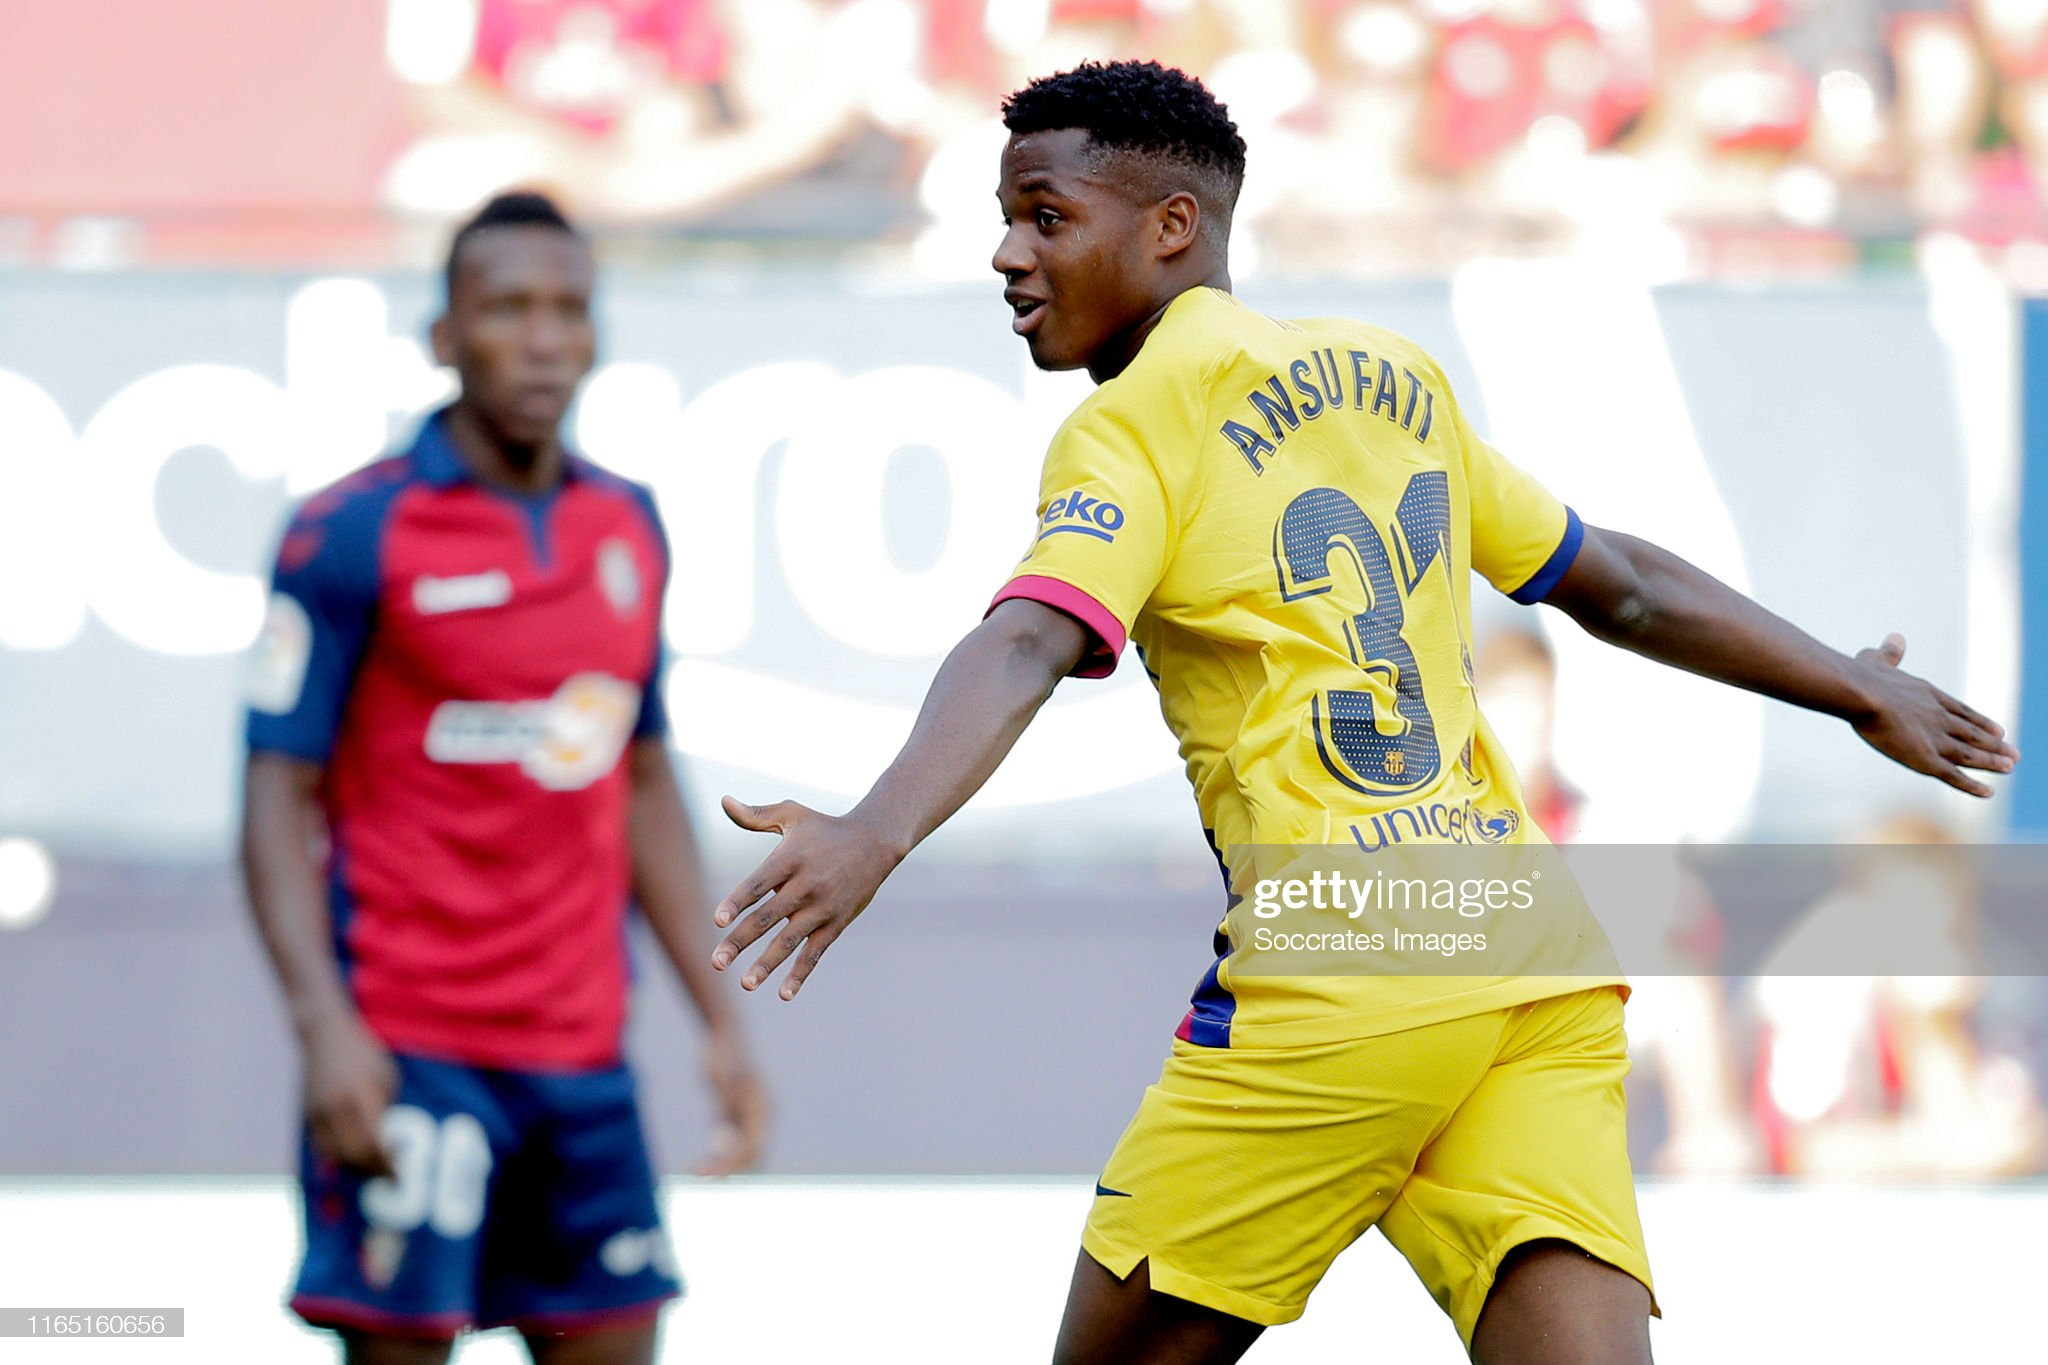 صور مباراة : أوساسونا - برشلونة 2-2 ( 31-08-2019 )  Ansu-fati-of-fc-barcelona-celebrates-during-the-la-liga-santander-picture-id1165160656?s=2048x2048